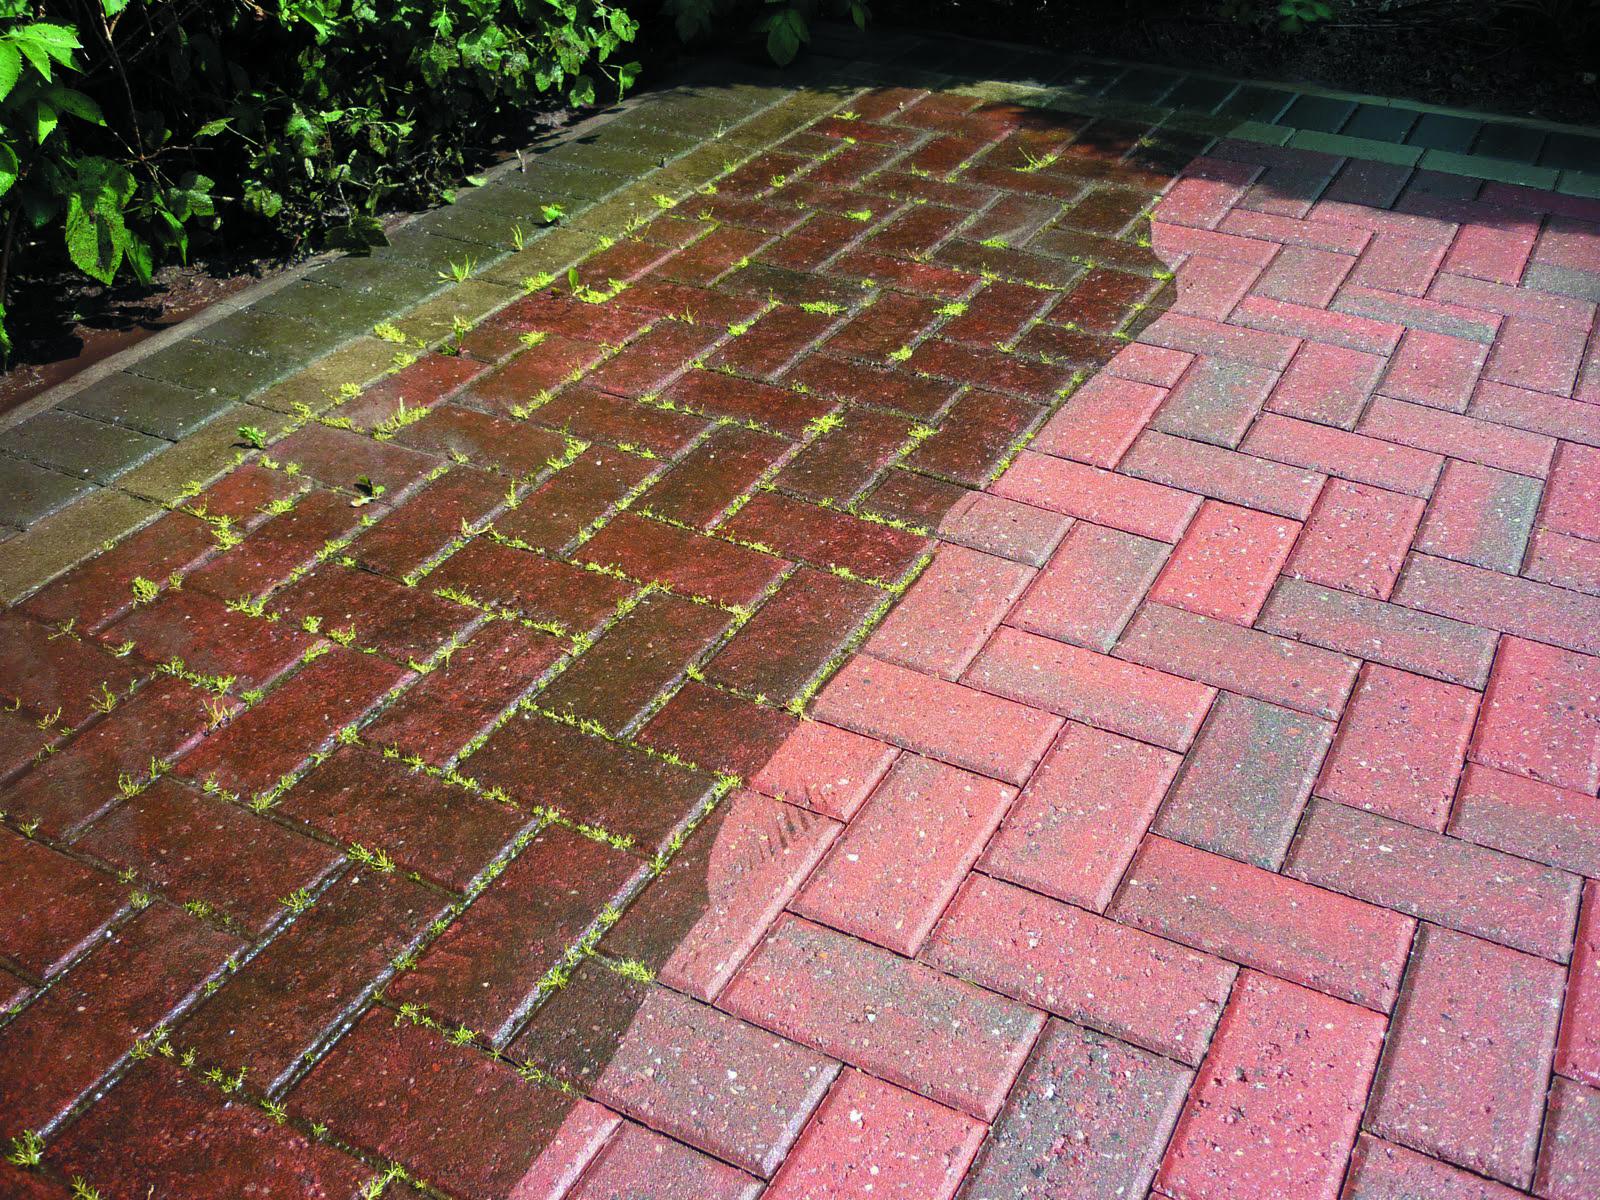 Block Paving & Driveways - Supreme Cleaning Ltd - Chesterfie